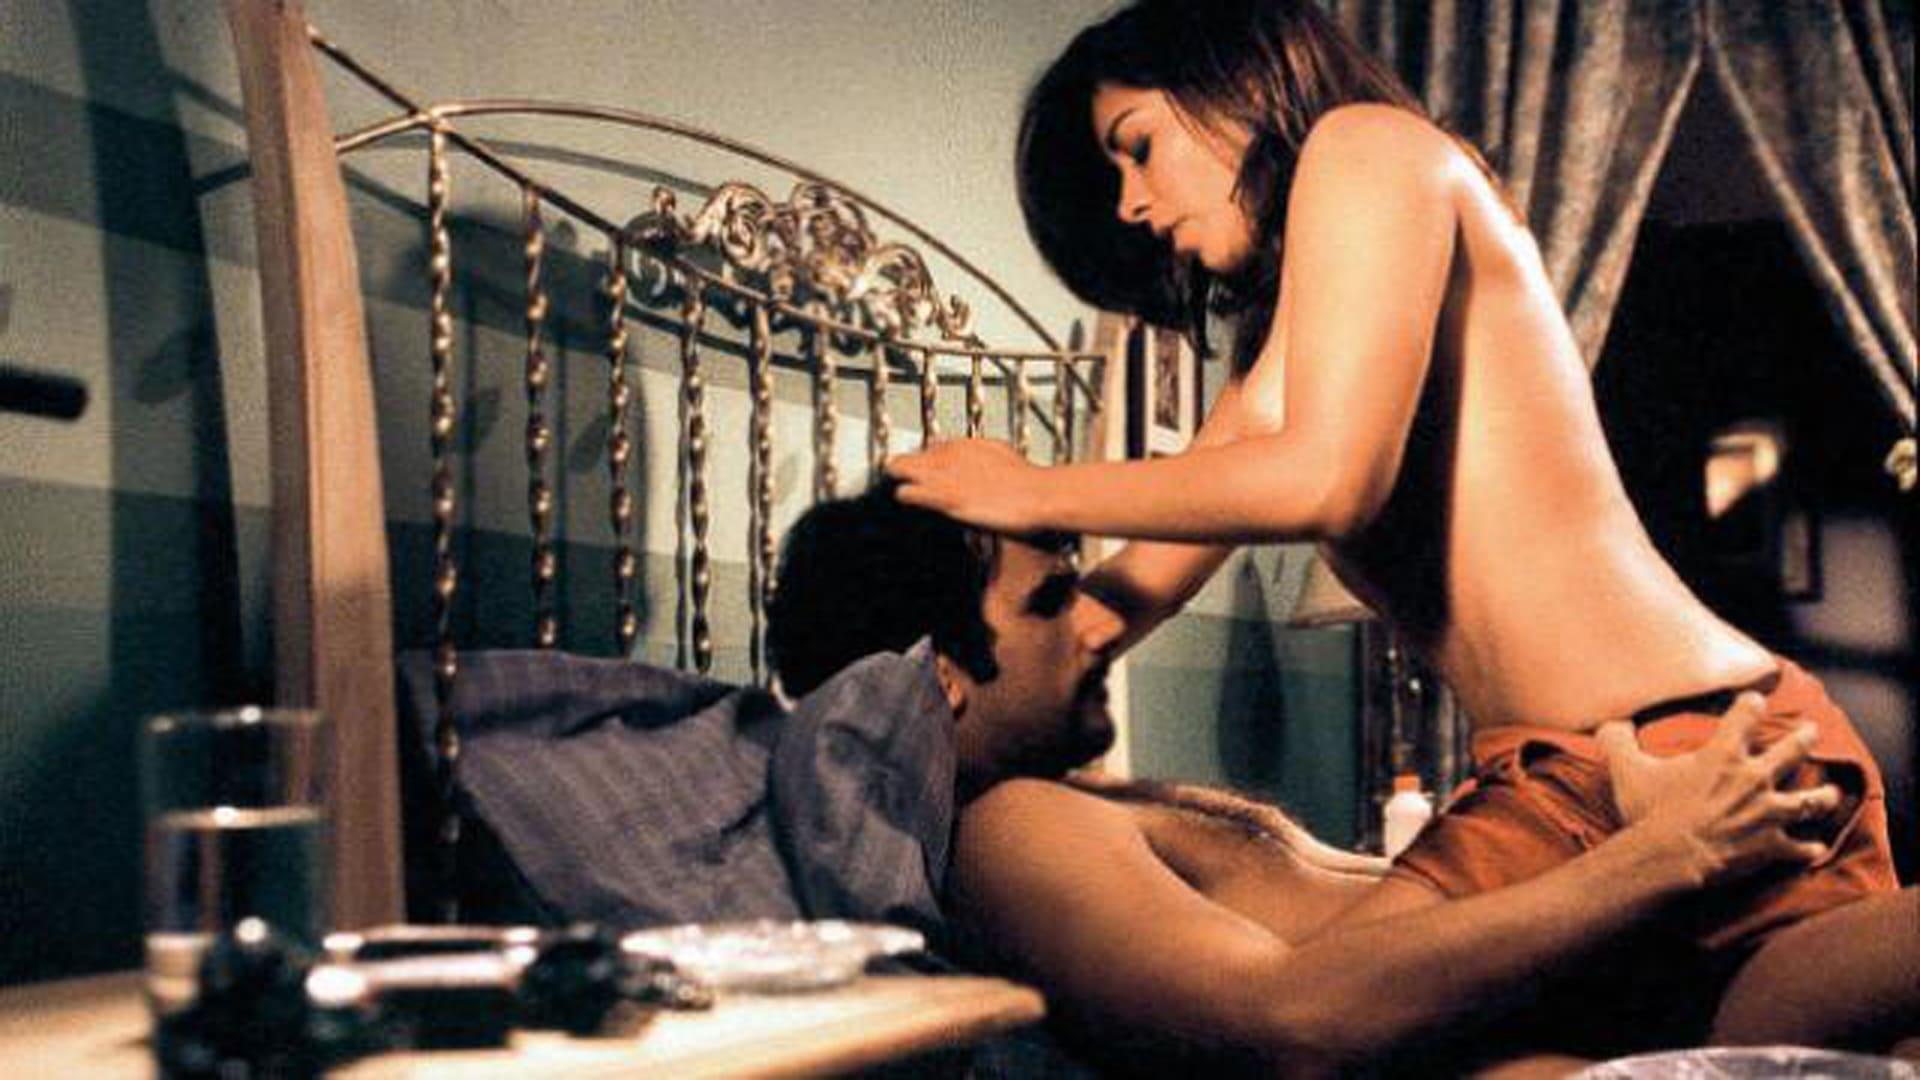 Согласен автором, эротика фильмы в hd онлайн